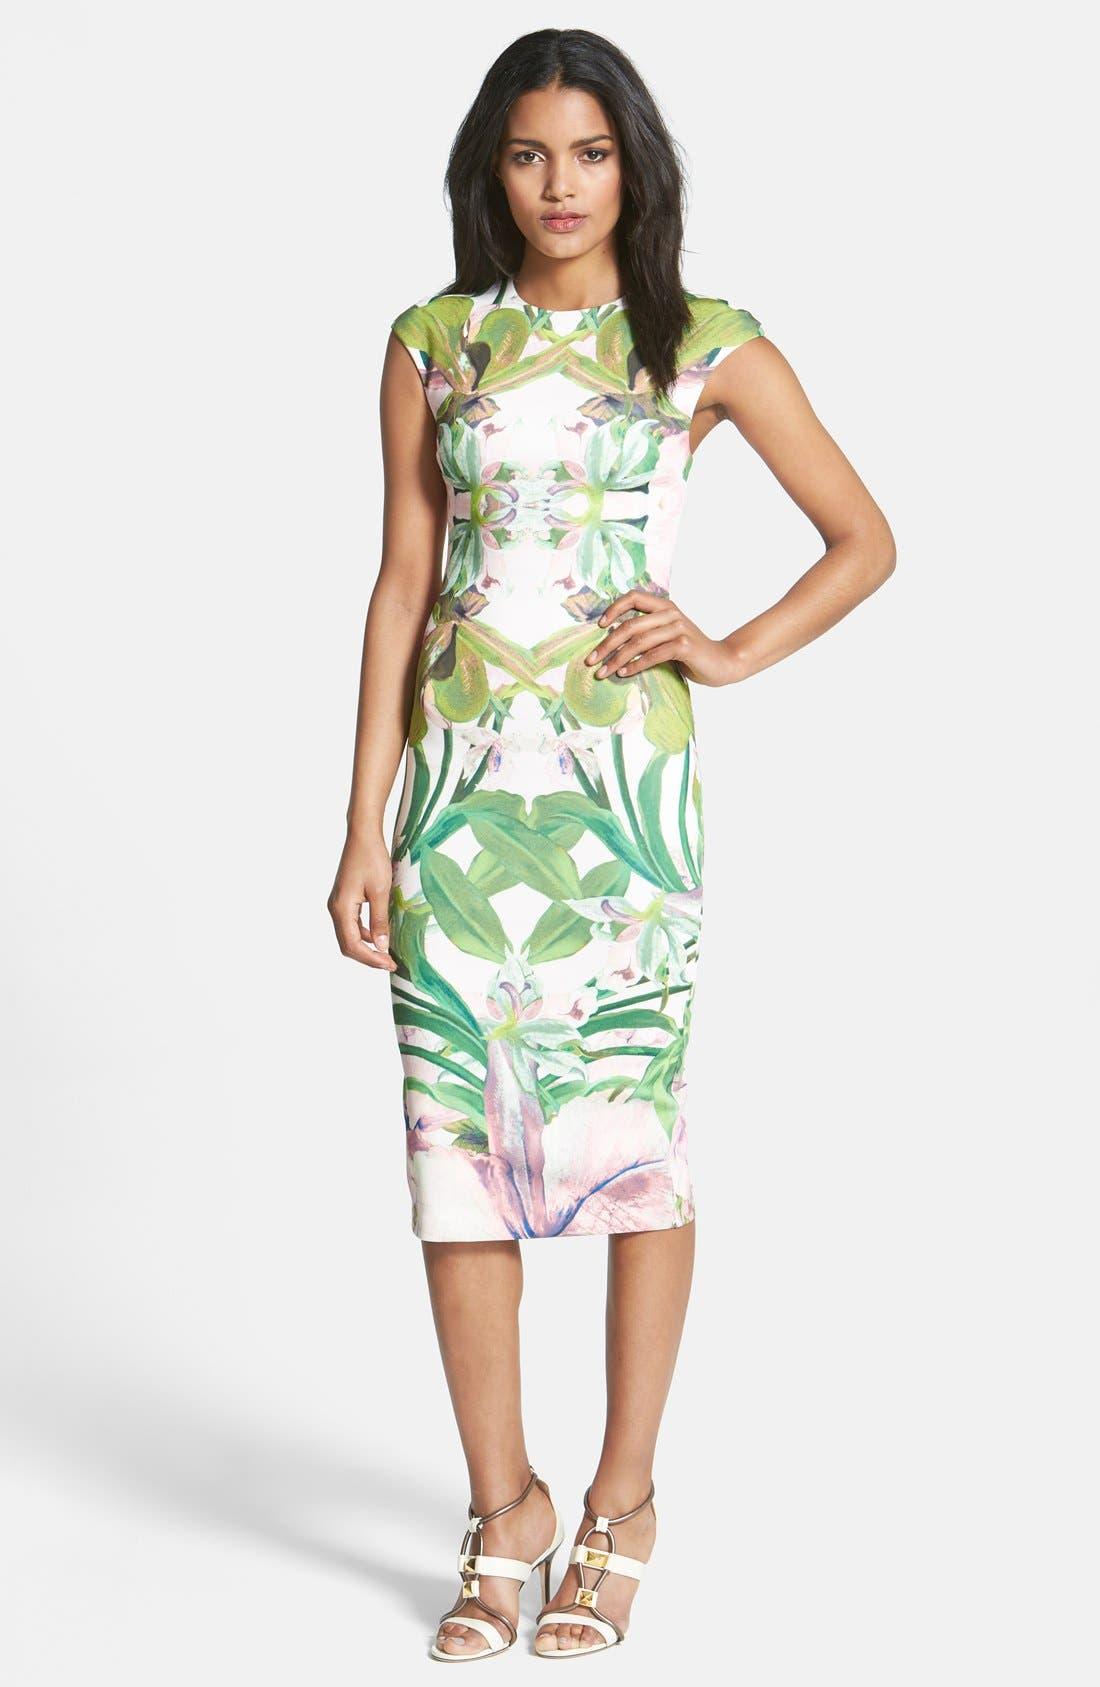 Main Image - Ted Baker London 'Jungle Orchid' Print Dress